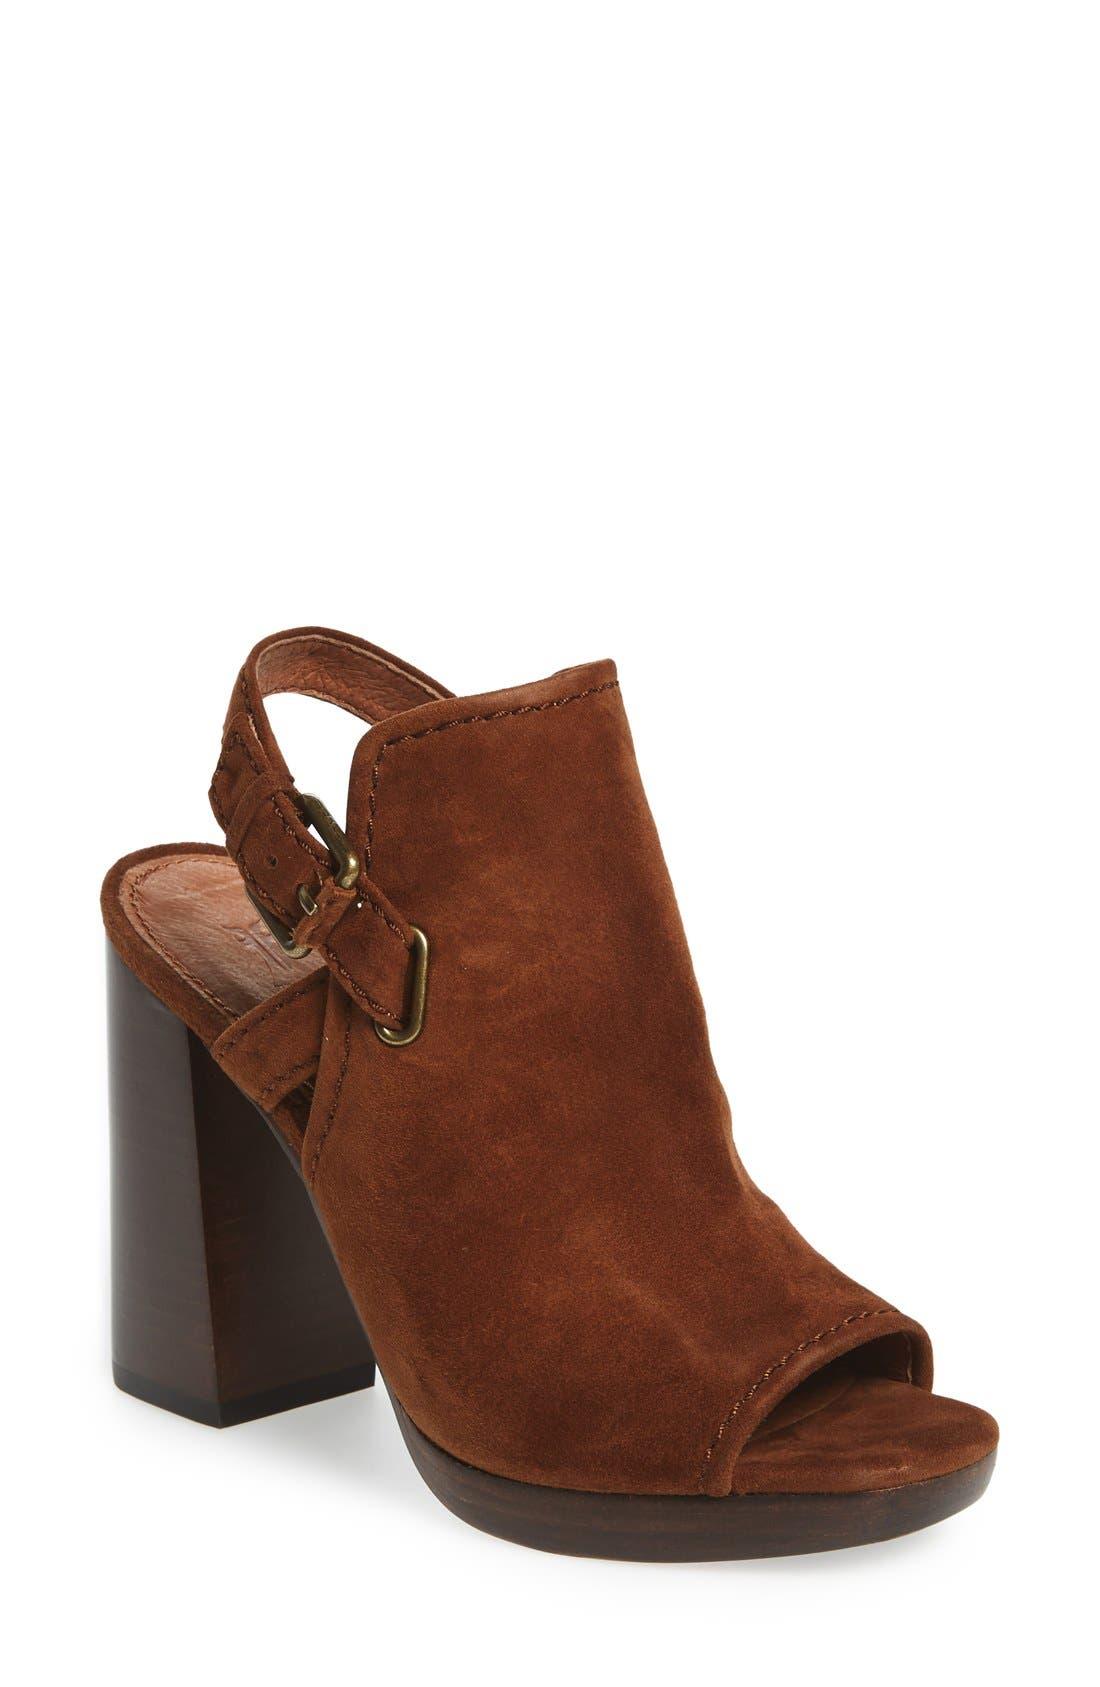 Alternate Image 1 Selected - Frye 'Karissa Shield' Sandal (Women)